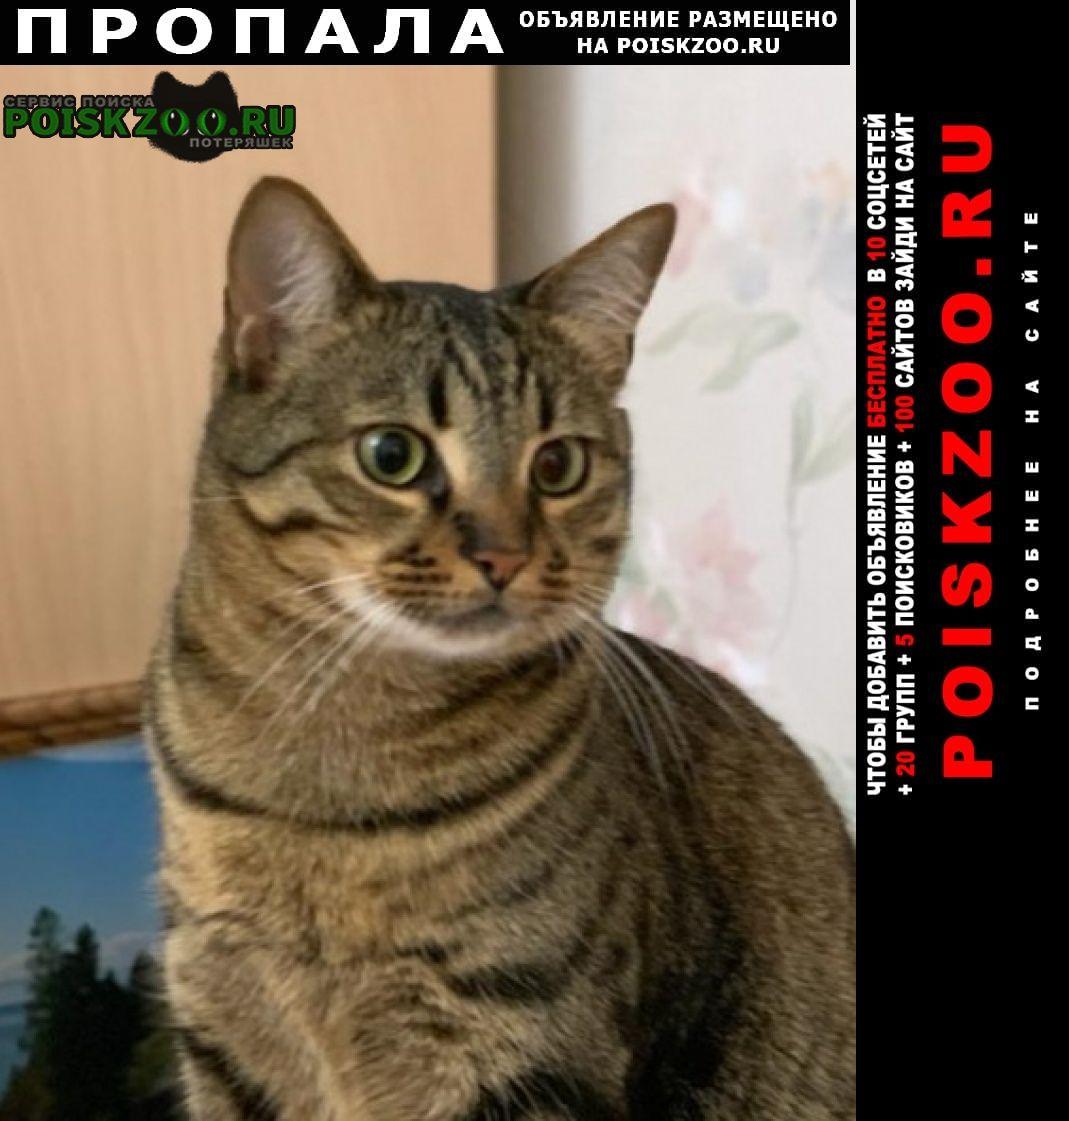 Пропал кот 3, 5 года тигрового окраса Санкт-Петербург